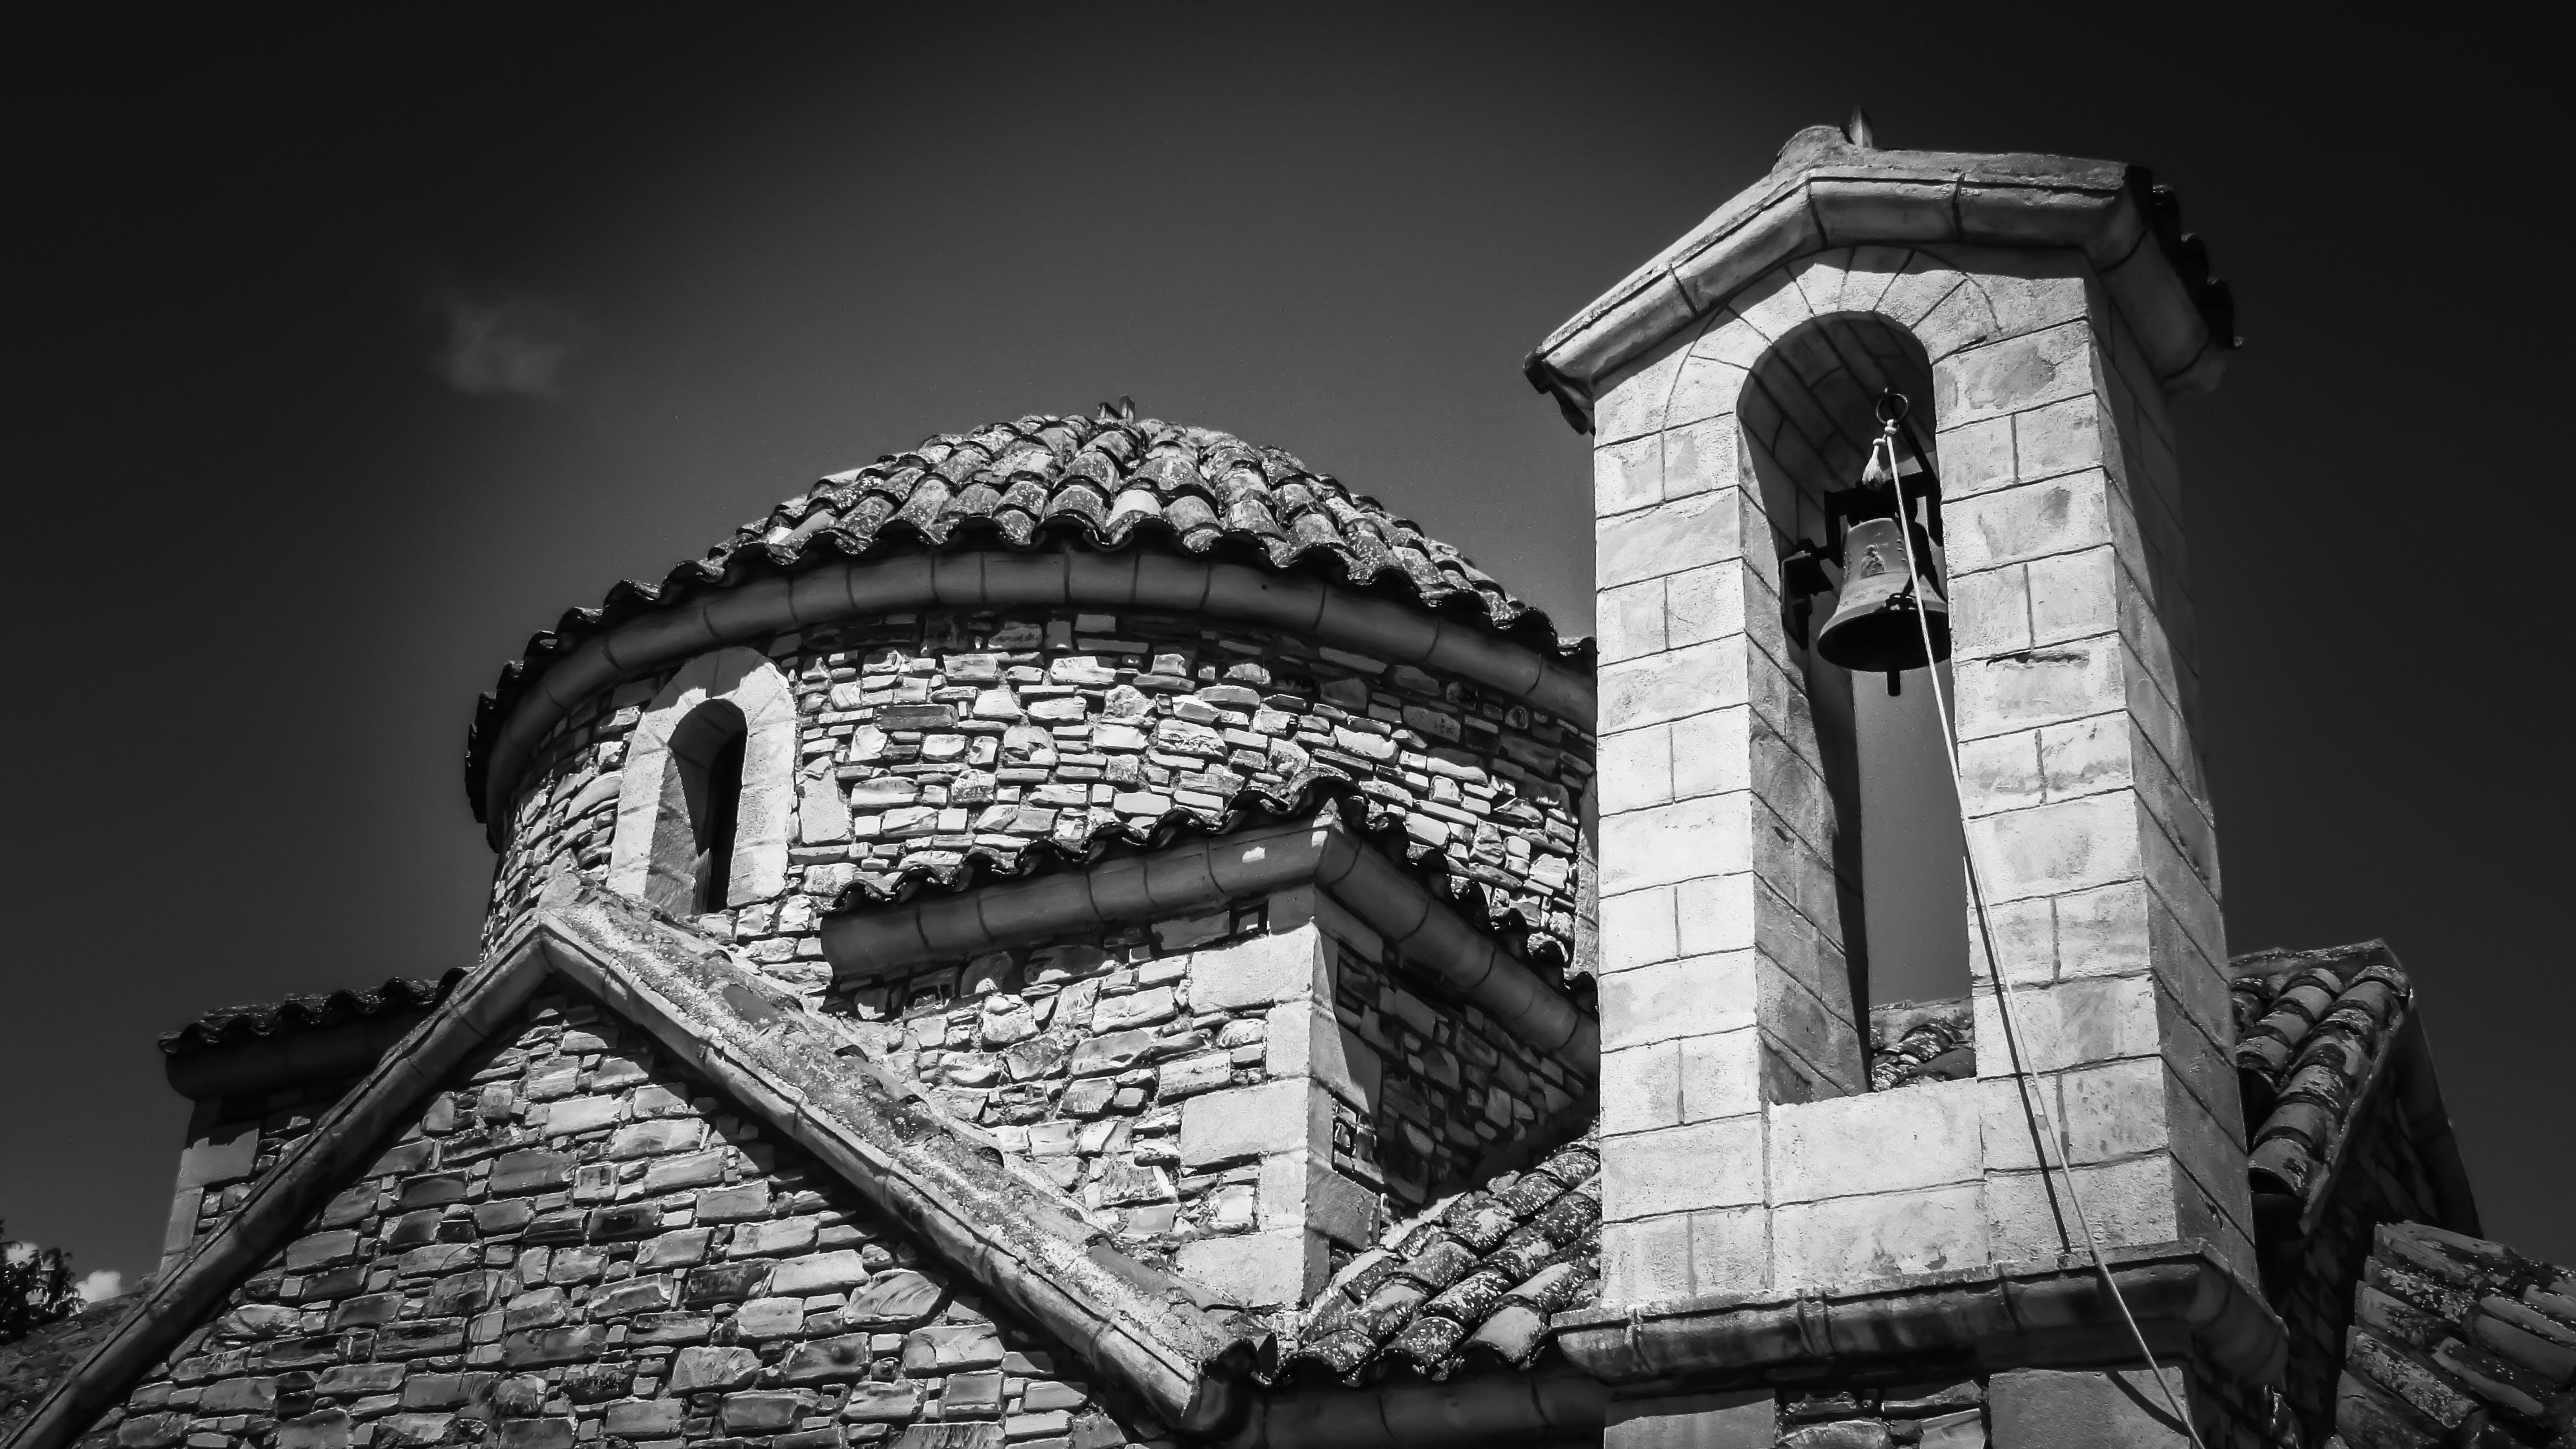 architecture, art, belfry